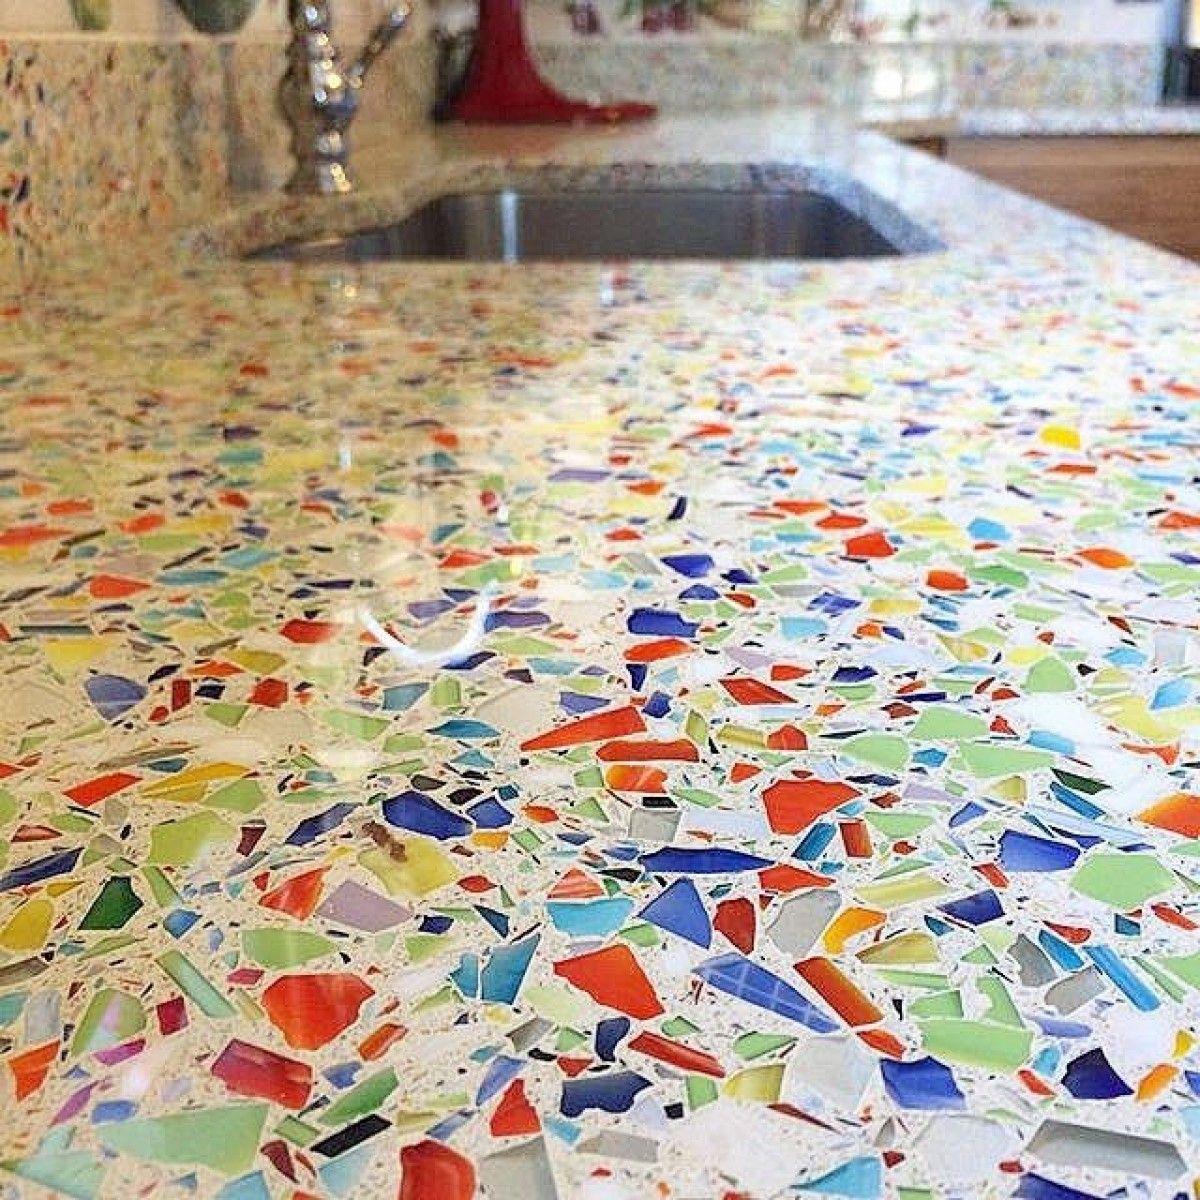 Vetrazzo Millefiori Glass Countertops Recycled Glass Countertops Recycled Glass